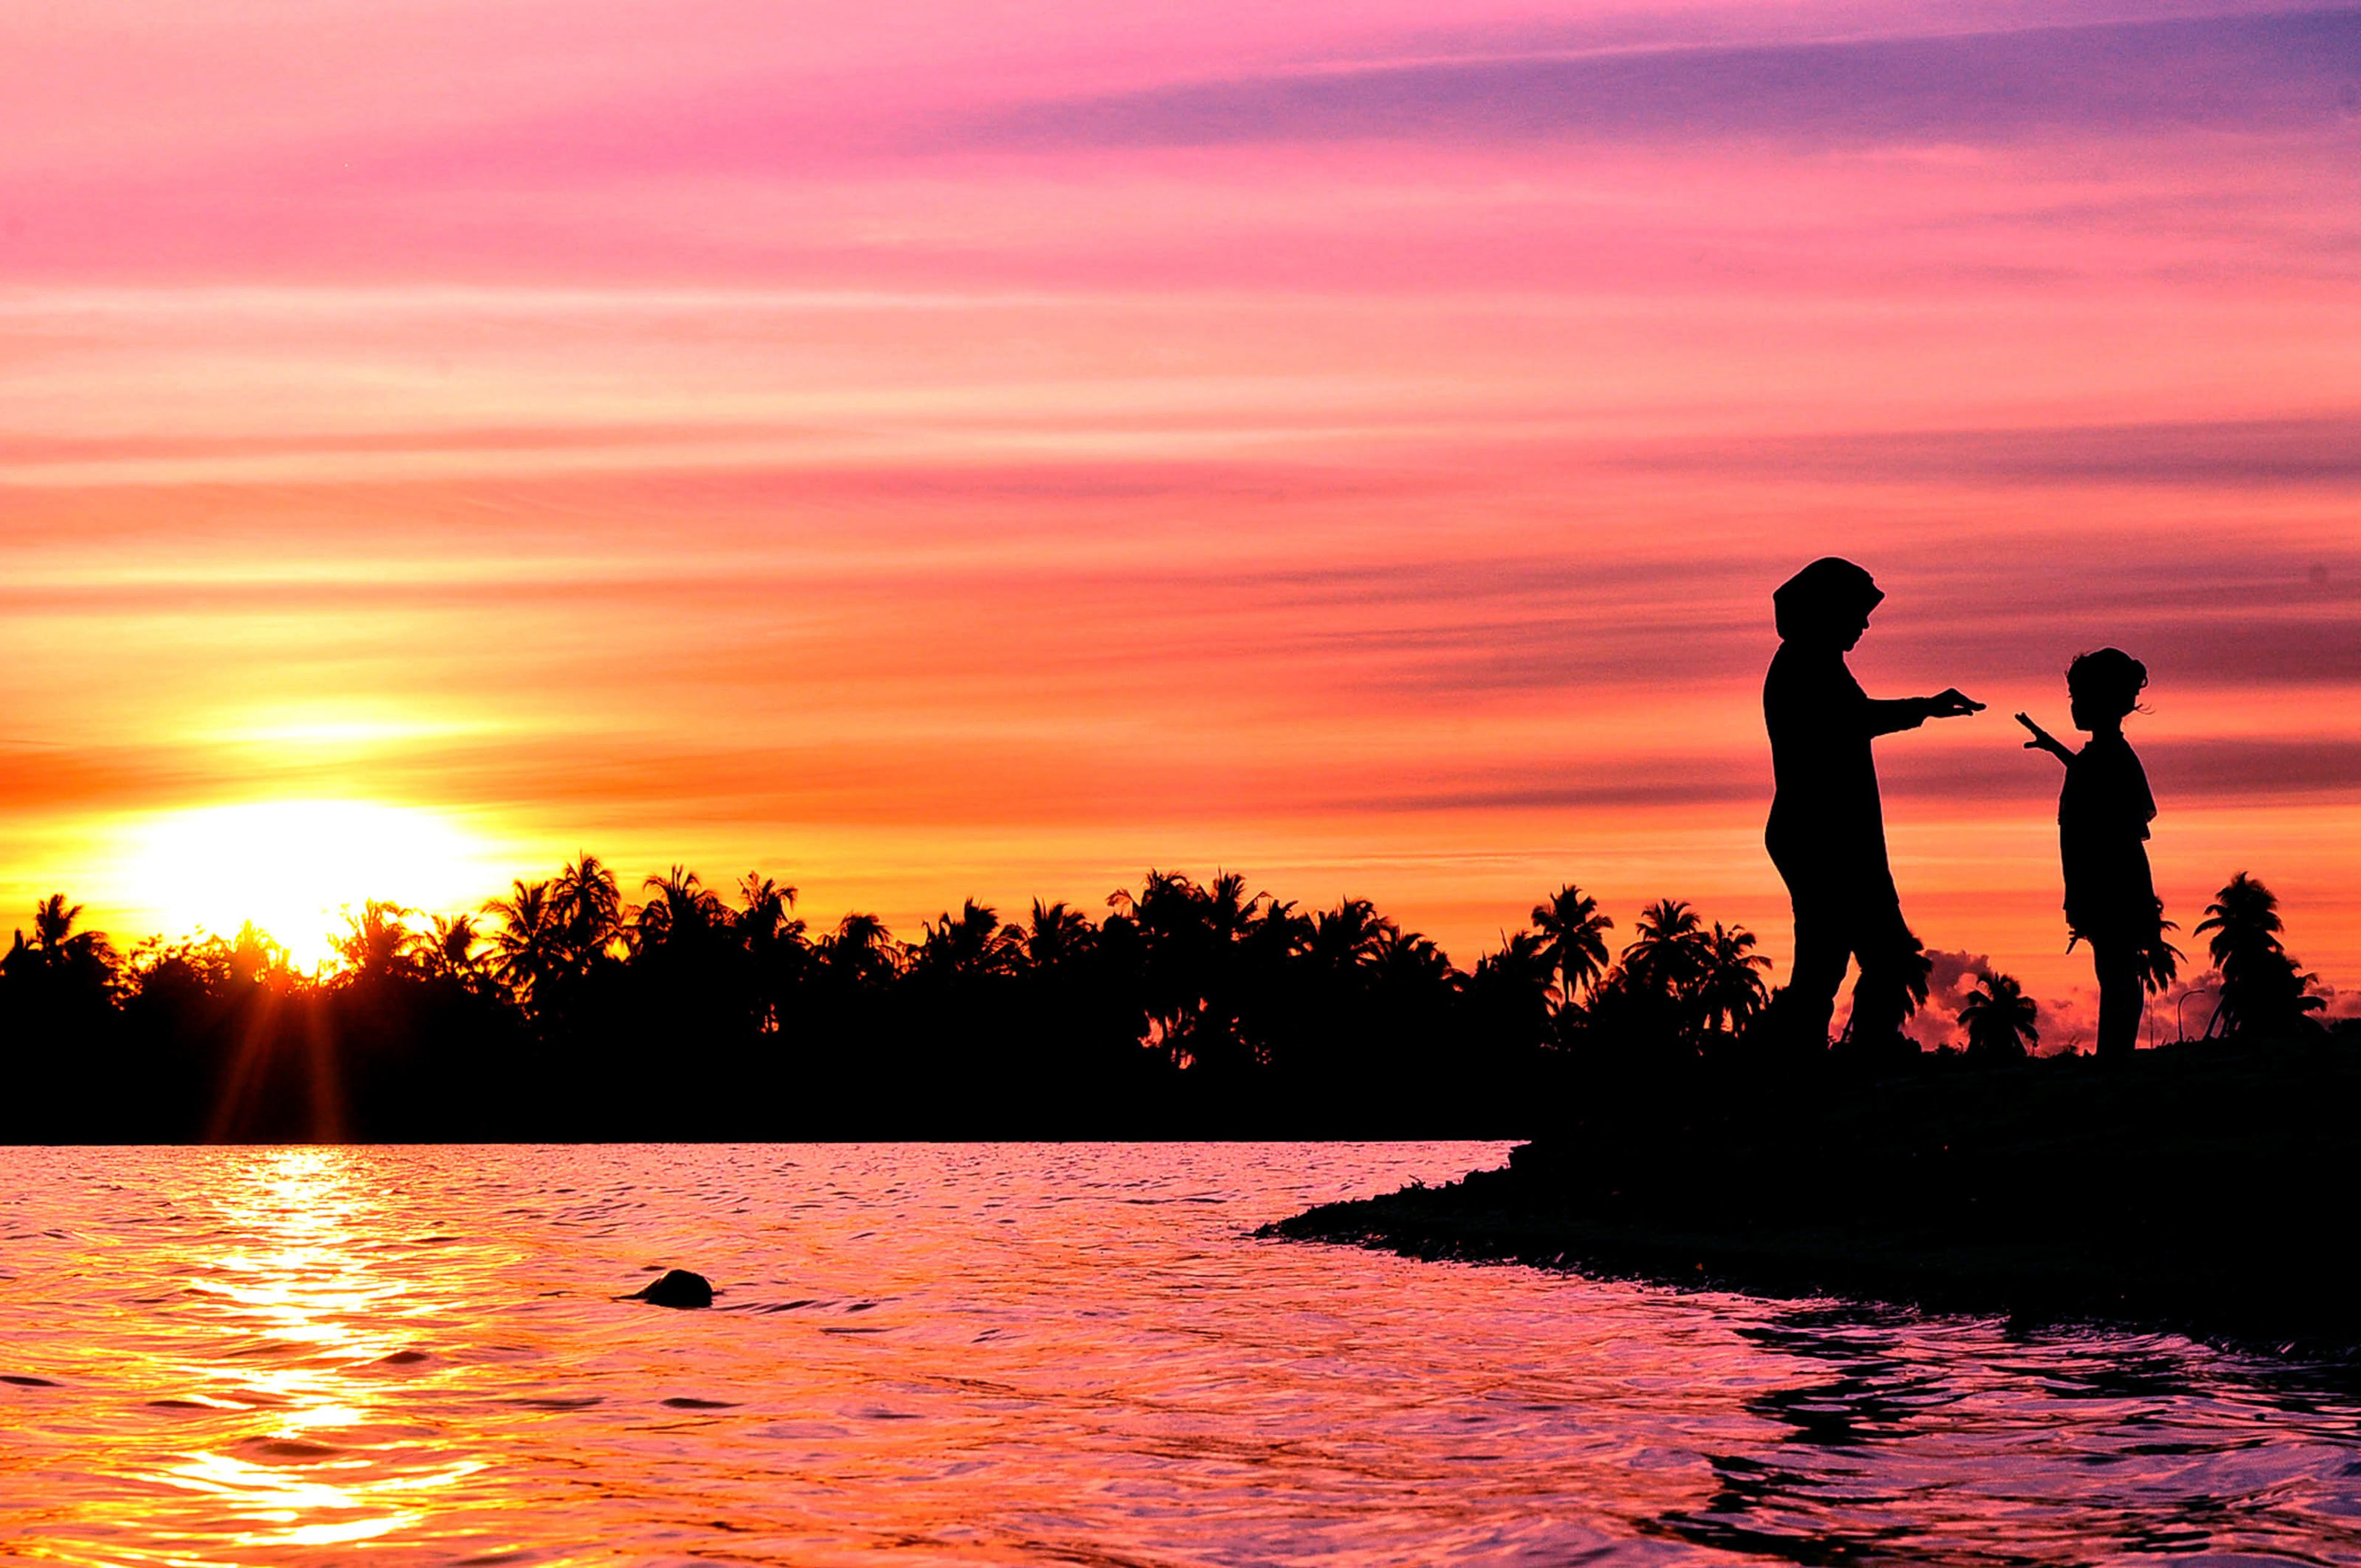 Kostenloses Stock Foto zu sonnenuntergang, strand, paar, liebe